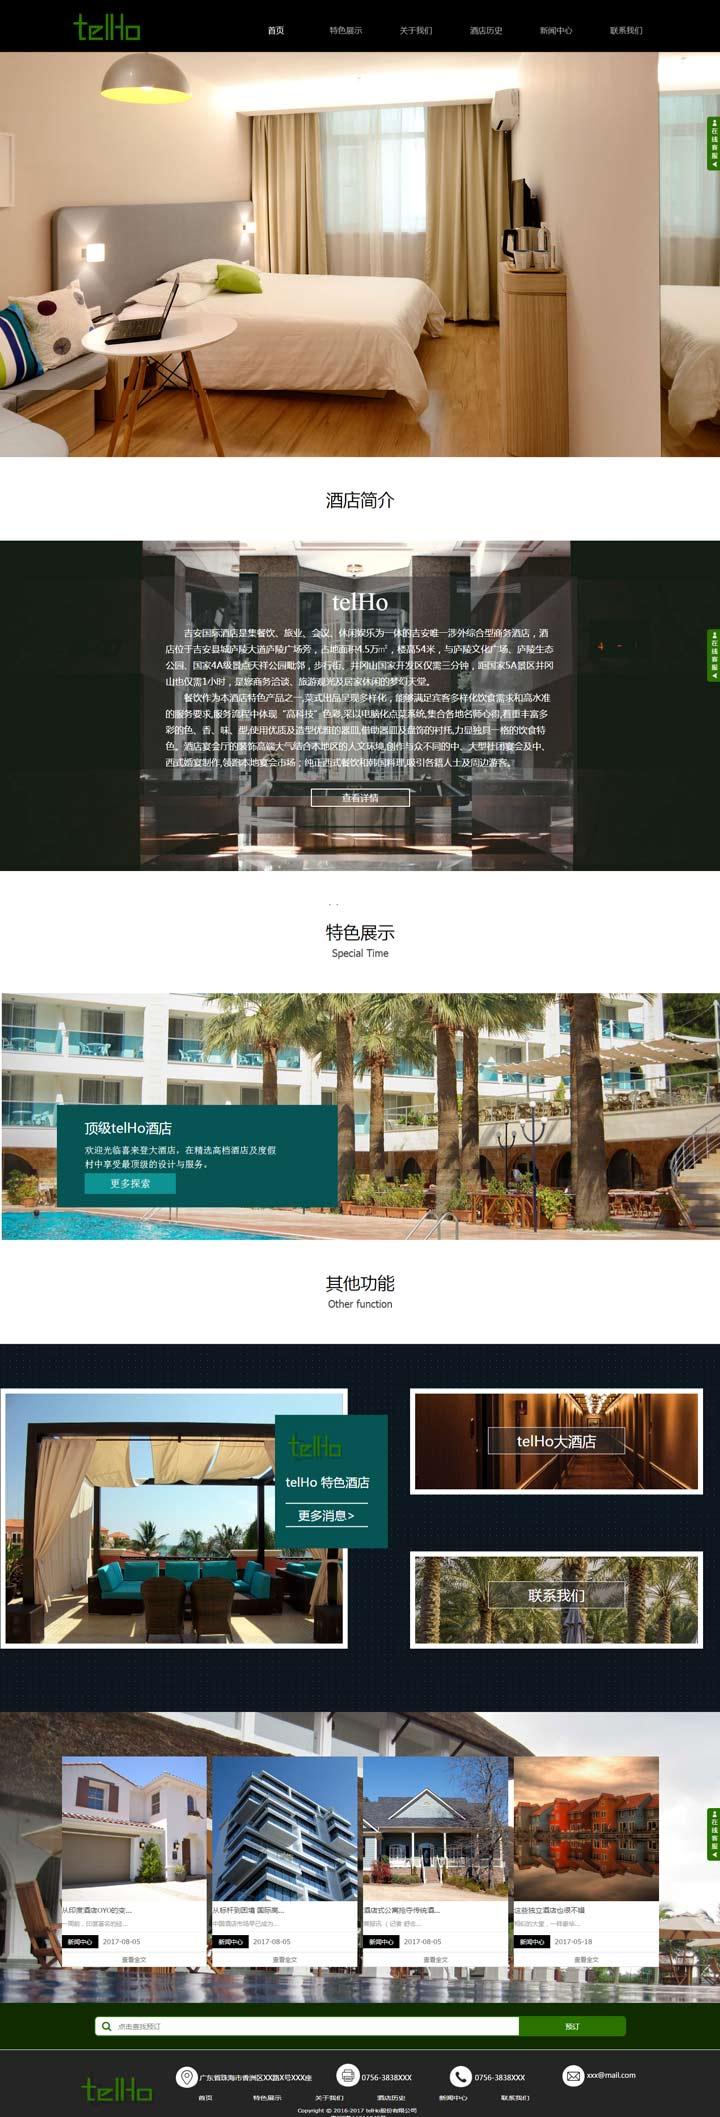 telHo酒店展示模板